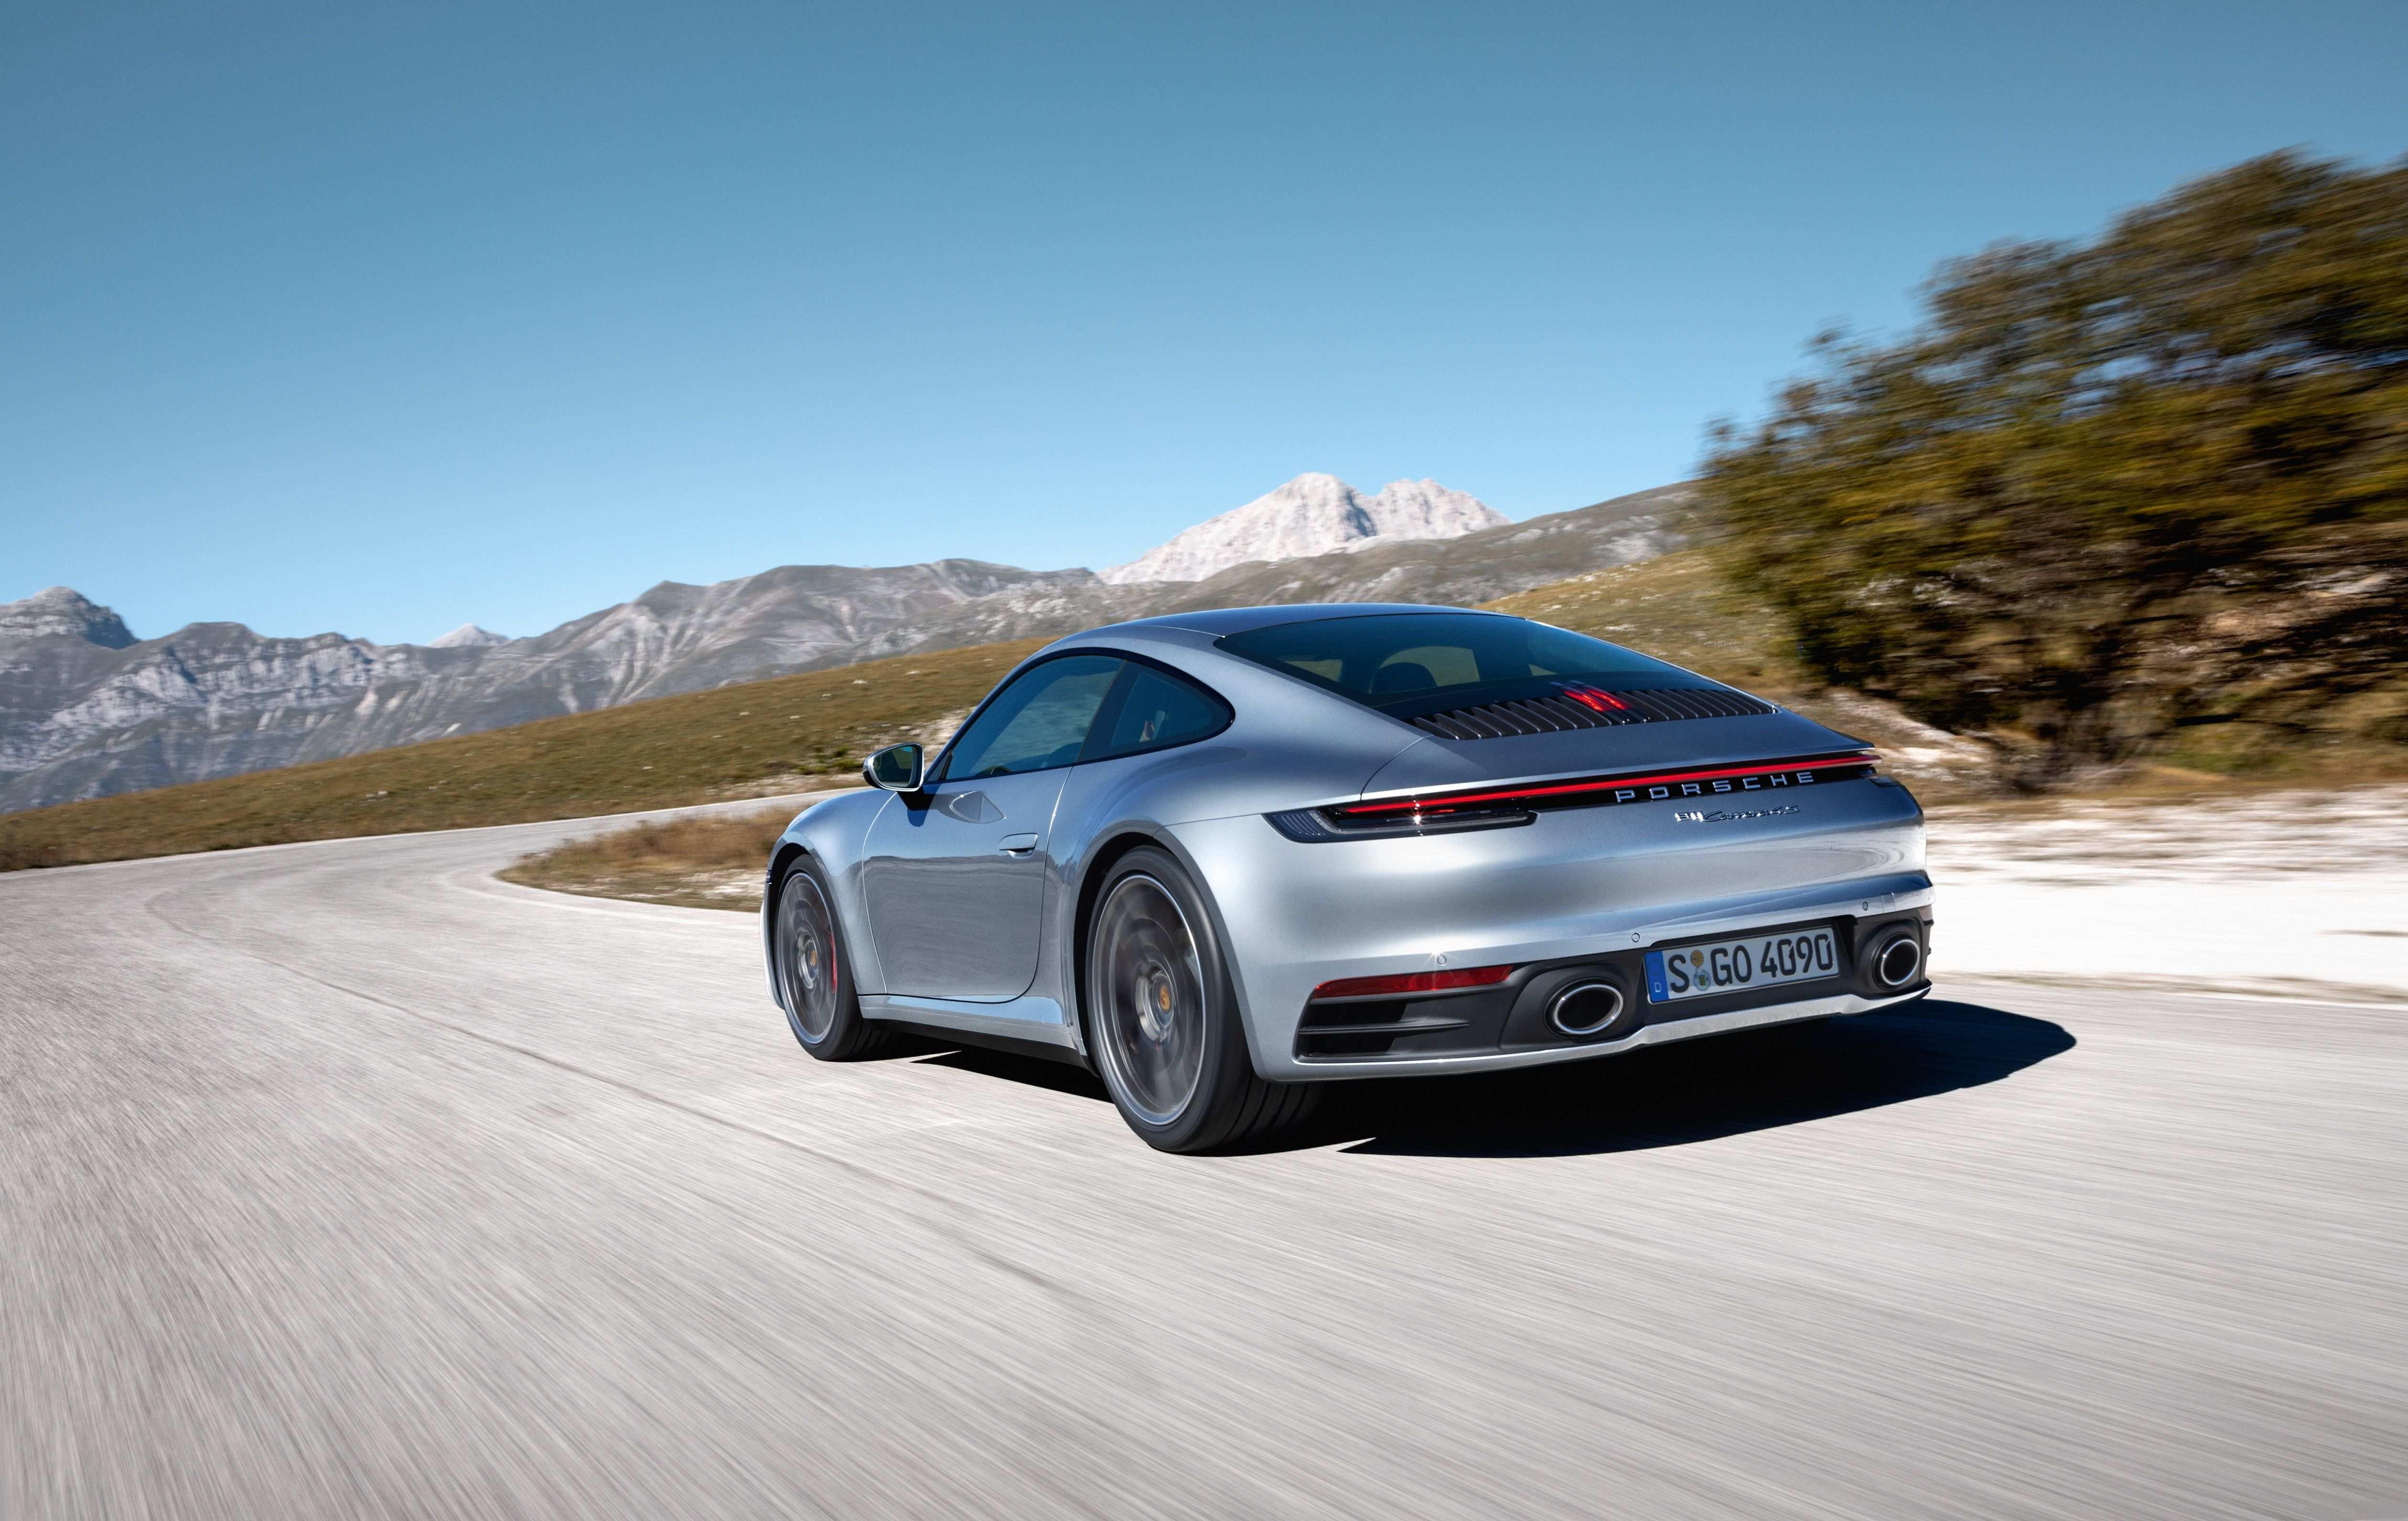 75 All New 2020 Porsche 911 Images with 2020 Porsche 911